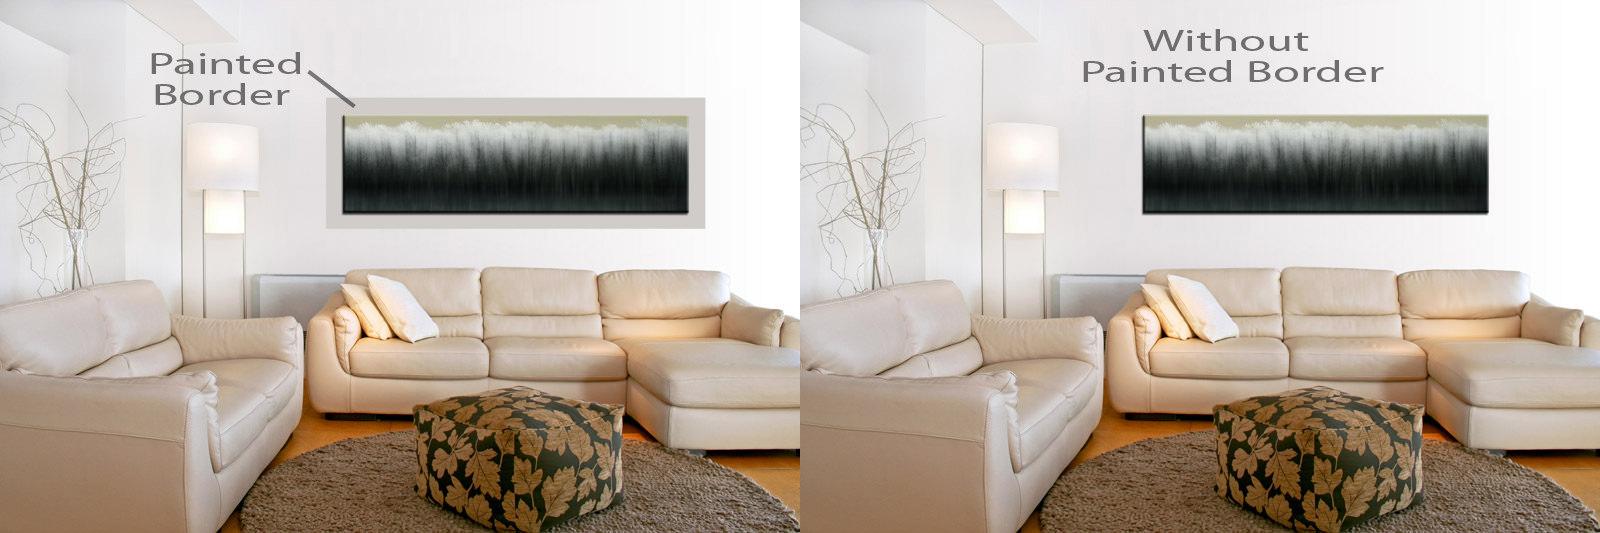 Using Wall Paint to Enhance Wall Art - Franklin Arts